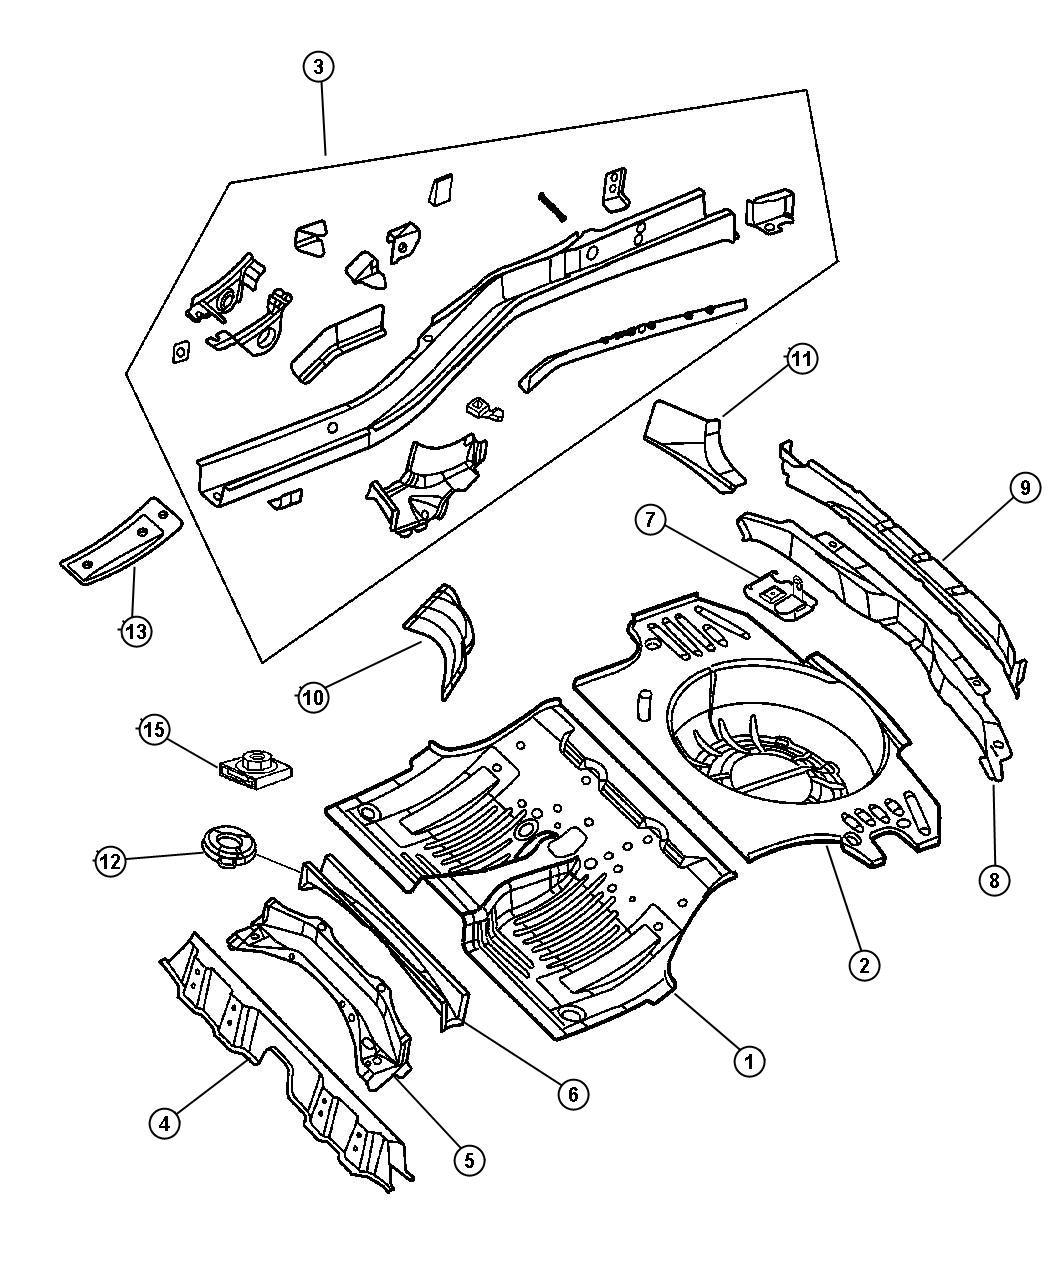 top suggestions 2009 jeep grand cherokee floor mats :